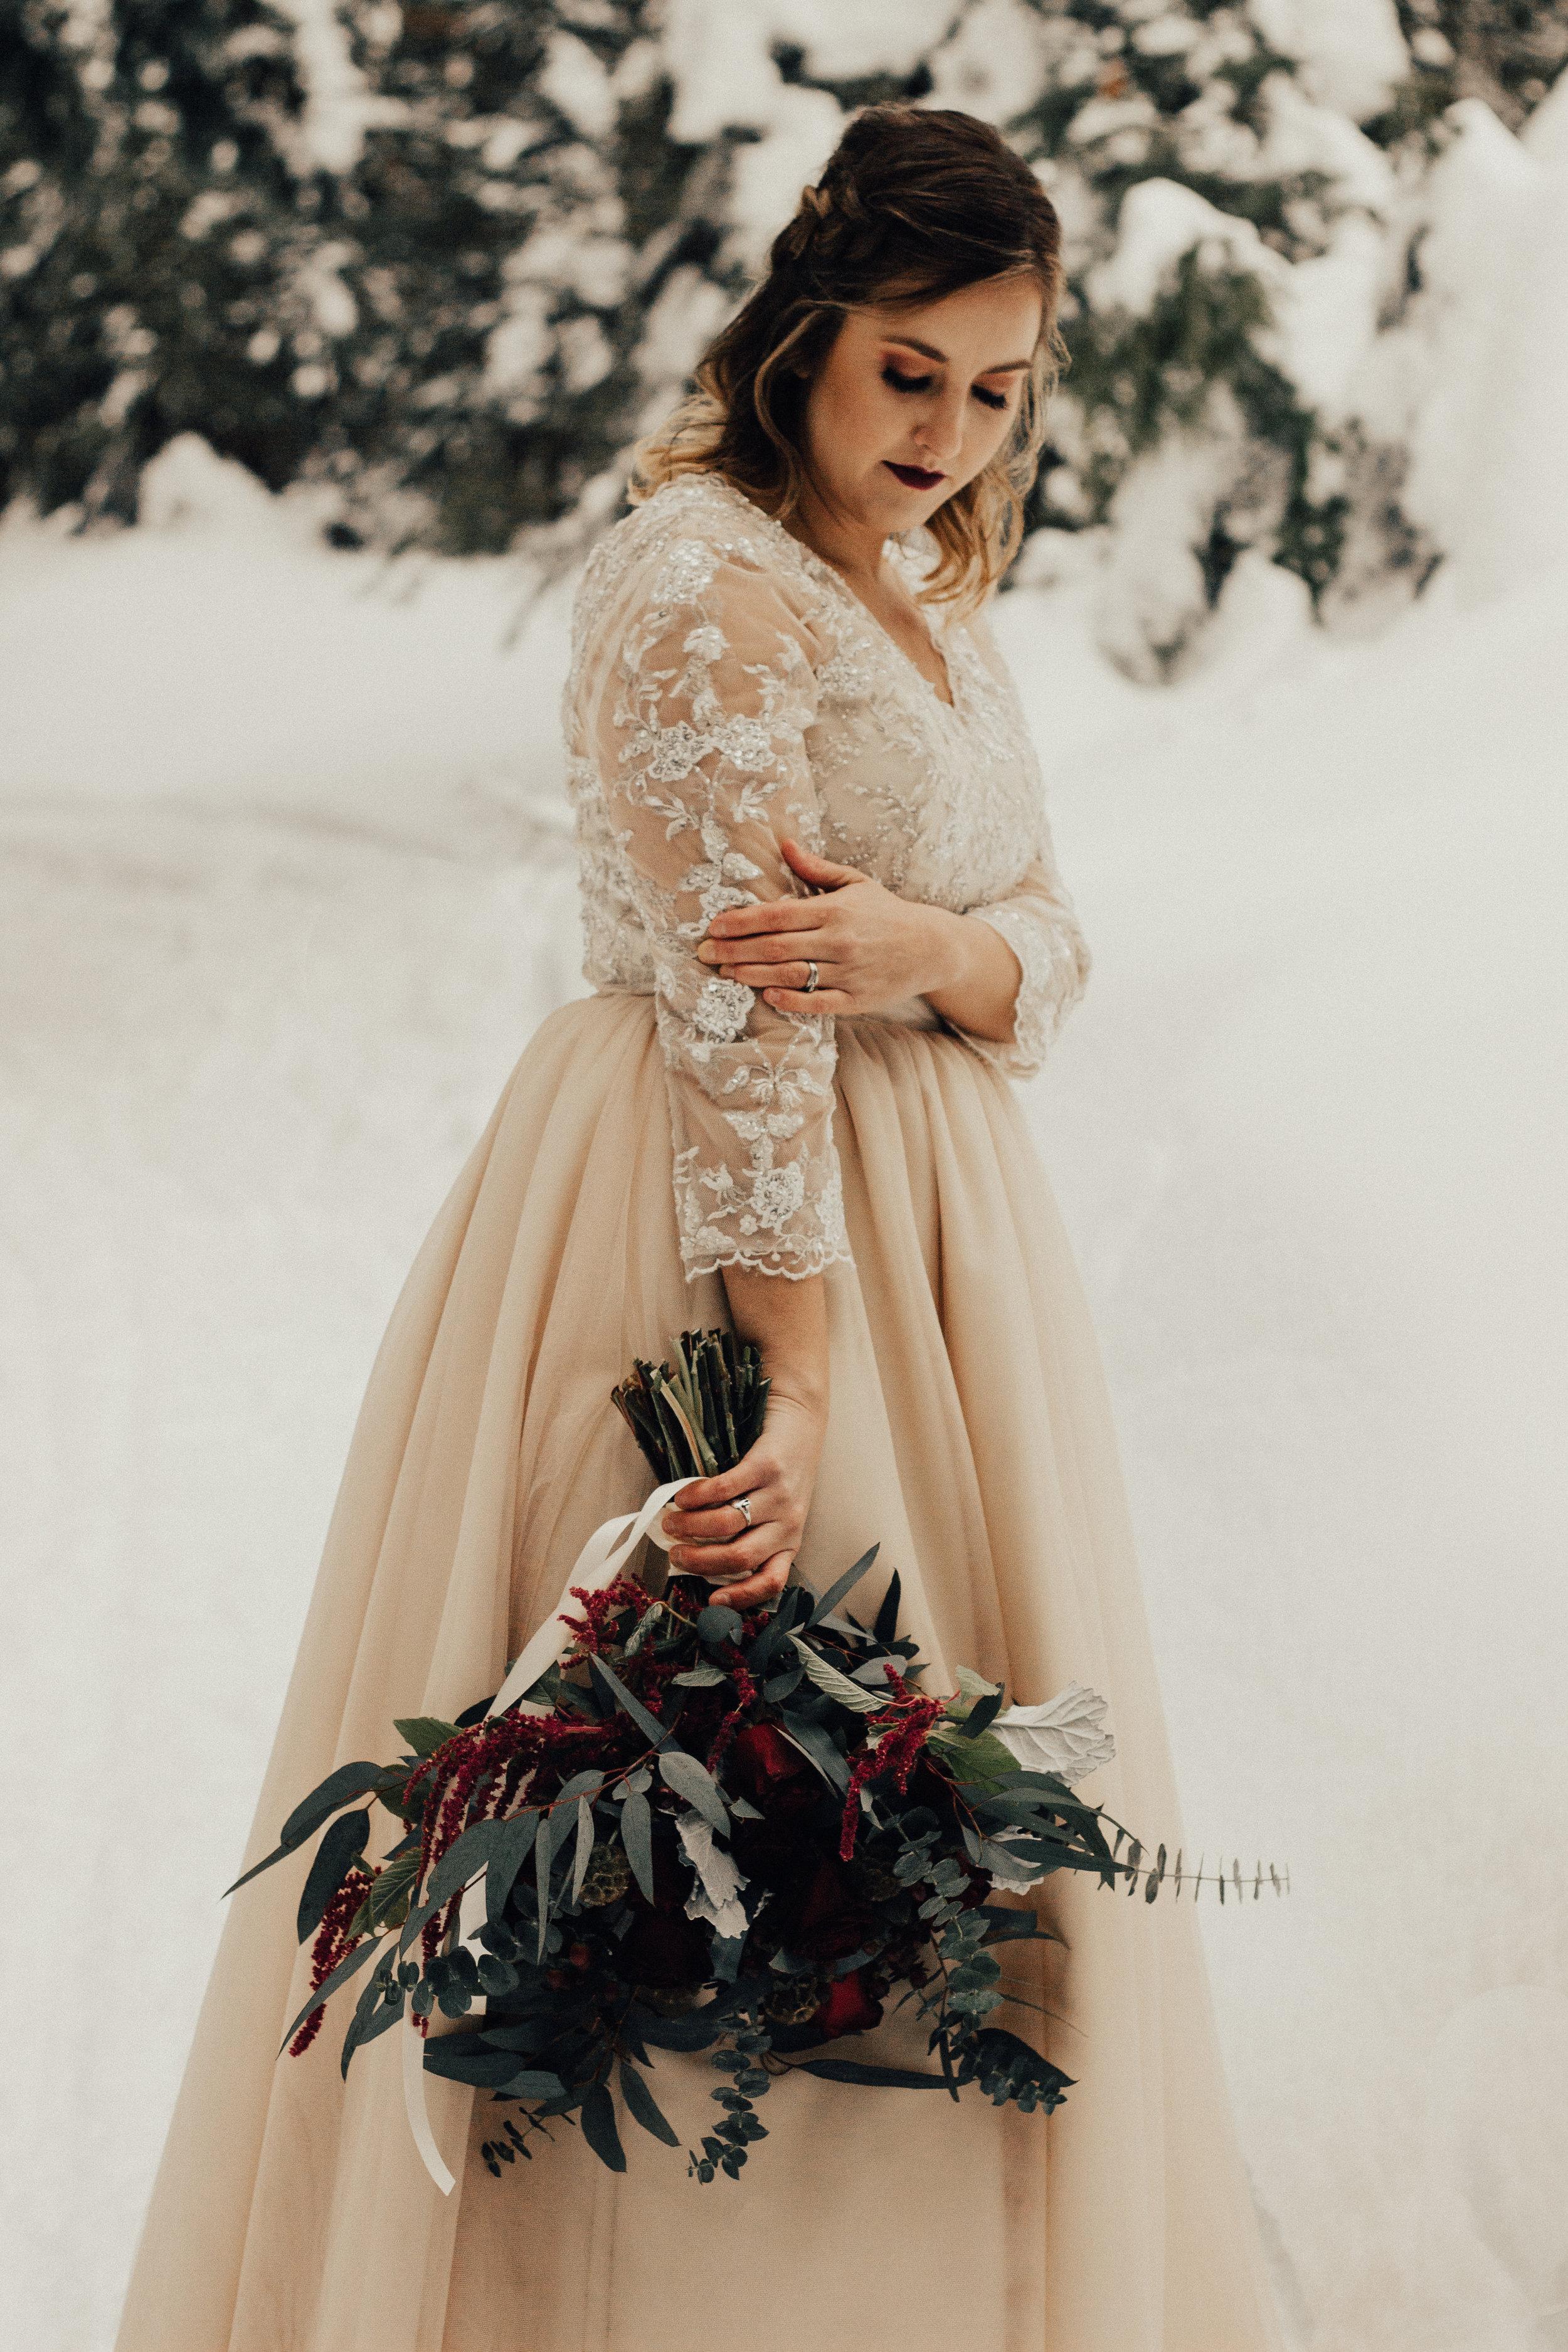 Styled-Winter-Elopement-86.jpg